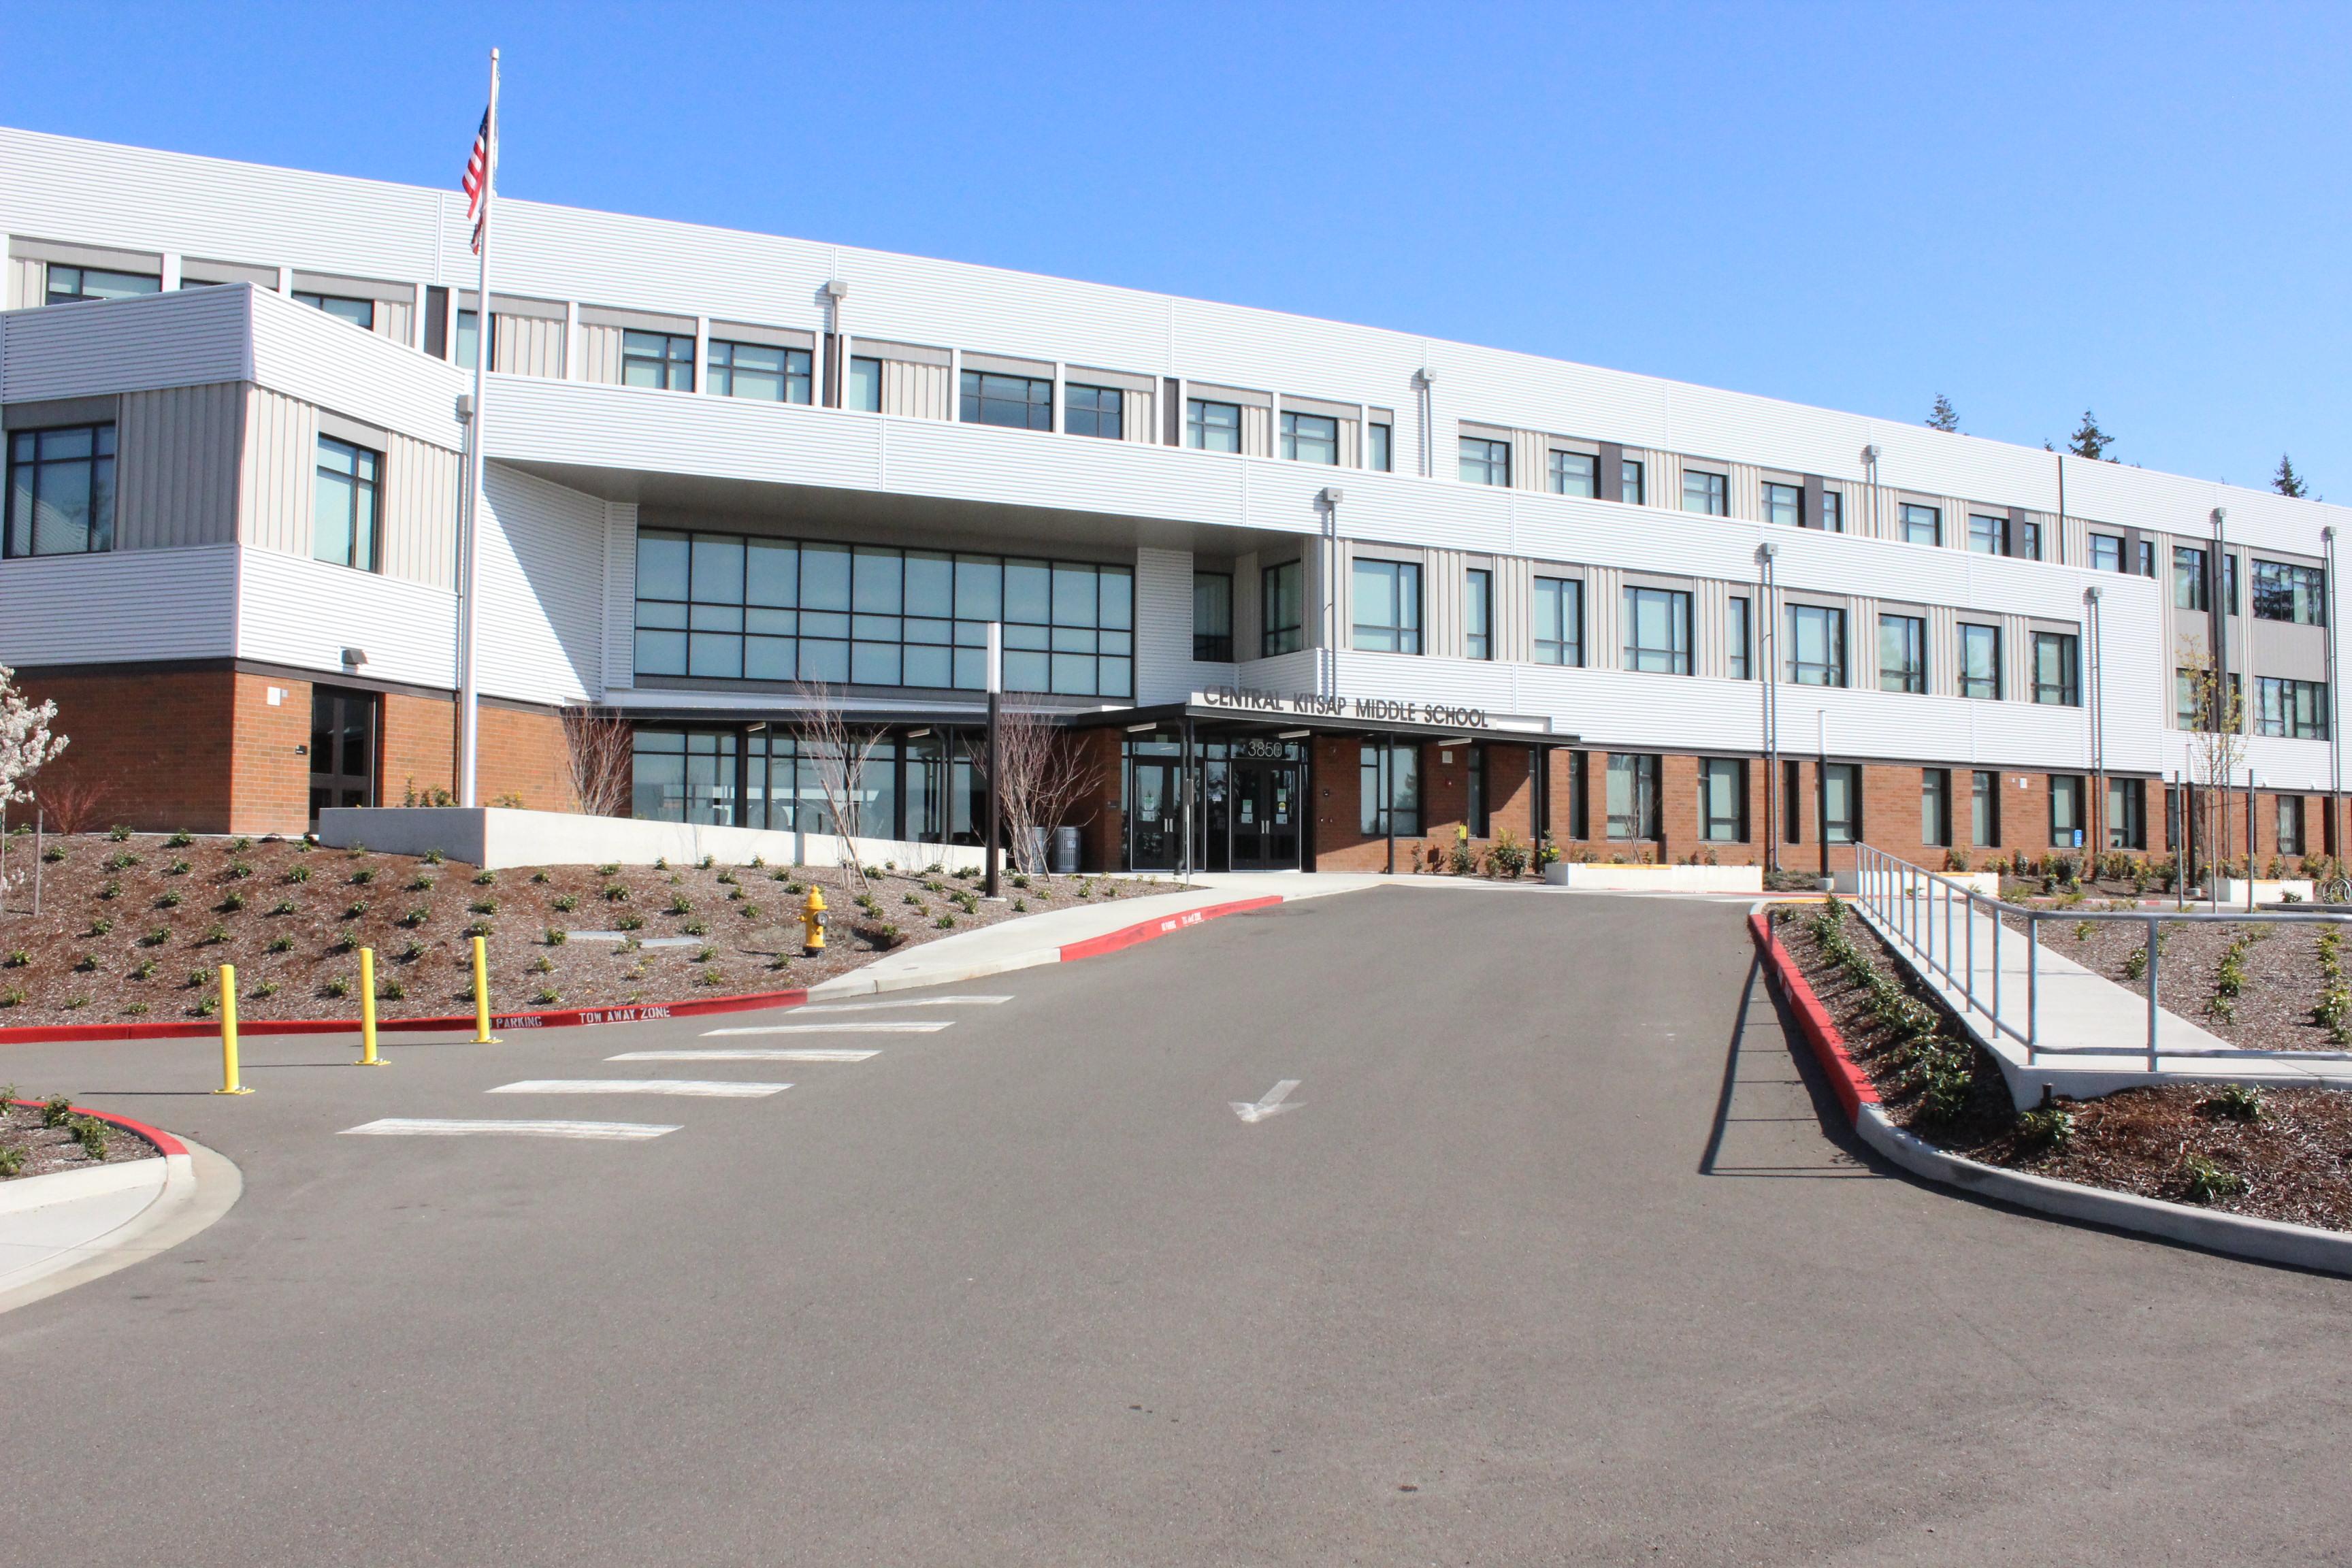 Central Kitsap High School & Middle School